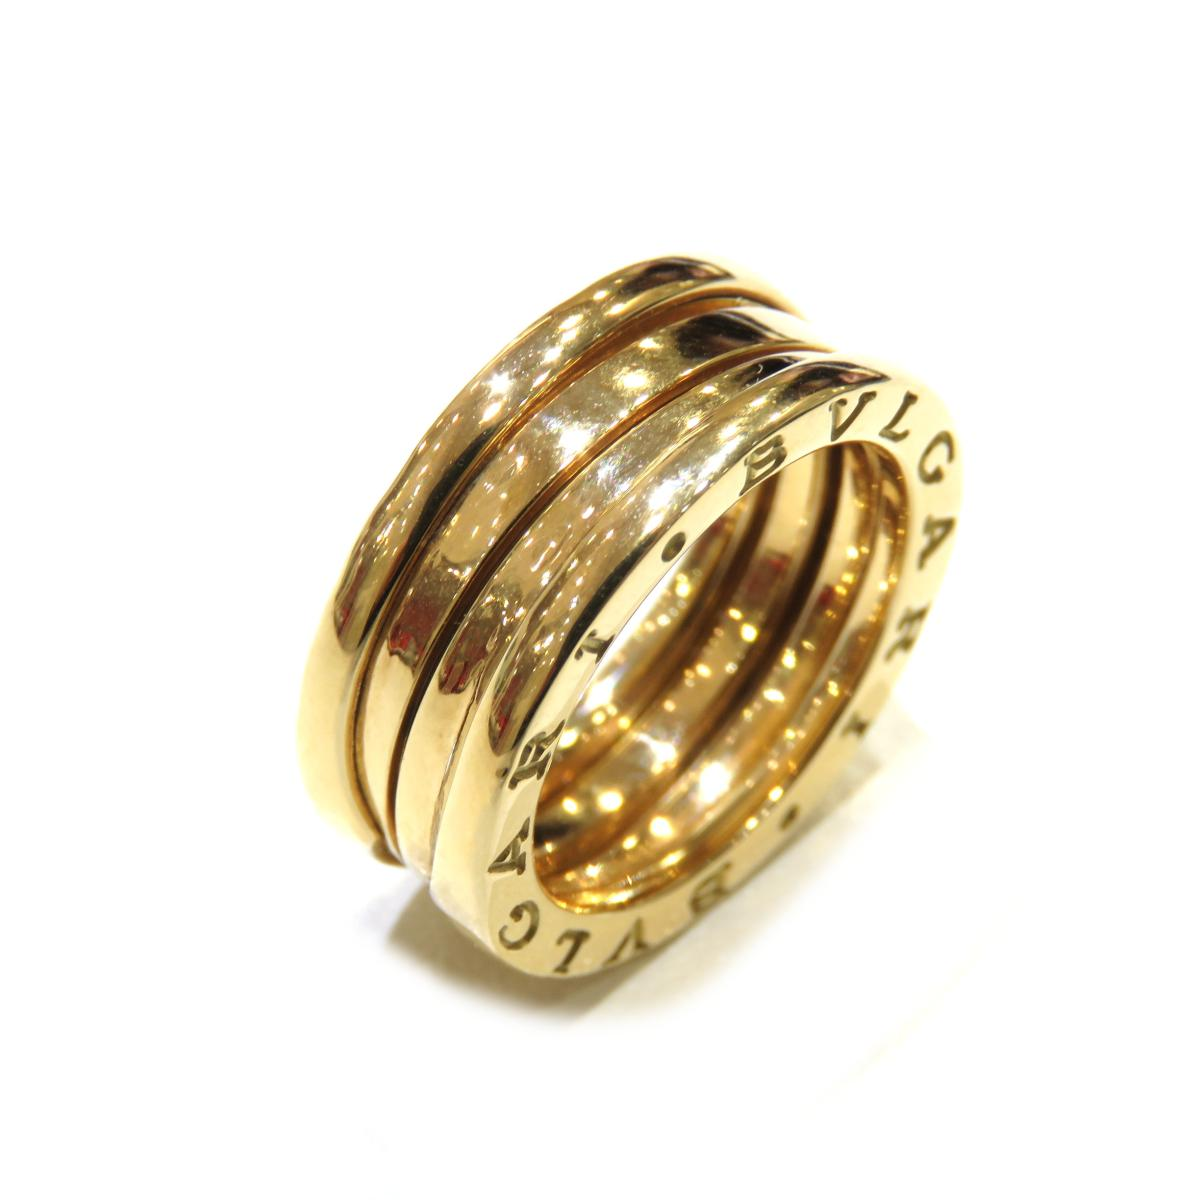 BVLGARI(ブルガリ)/B-zero1 リング Sサイズ 指輪 セール/リング//K18YG(750)イエローゴールド/【ランクA】/#53/12.5号【中古】